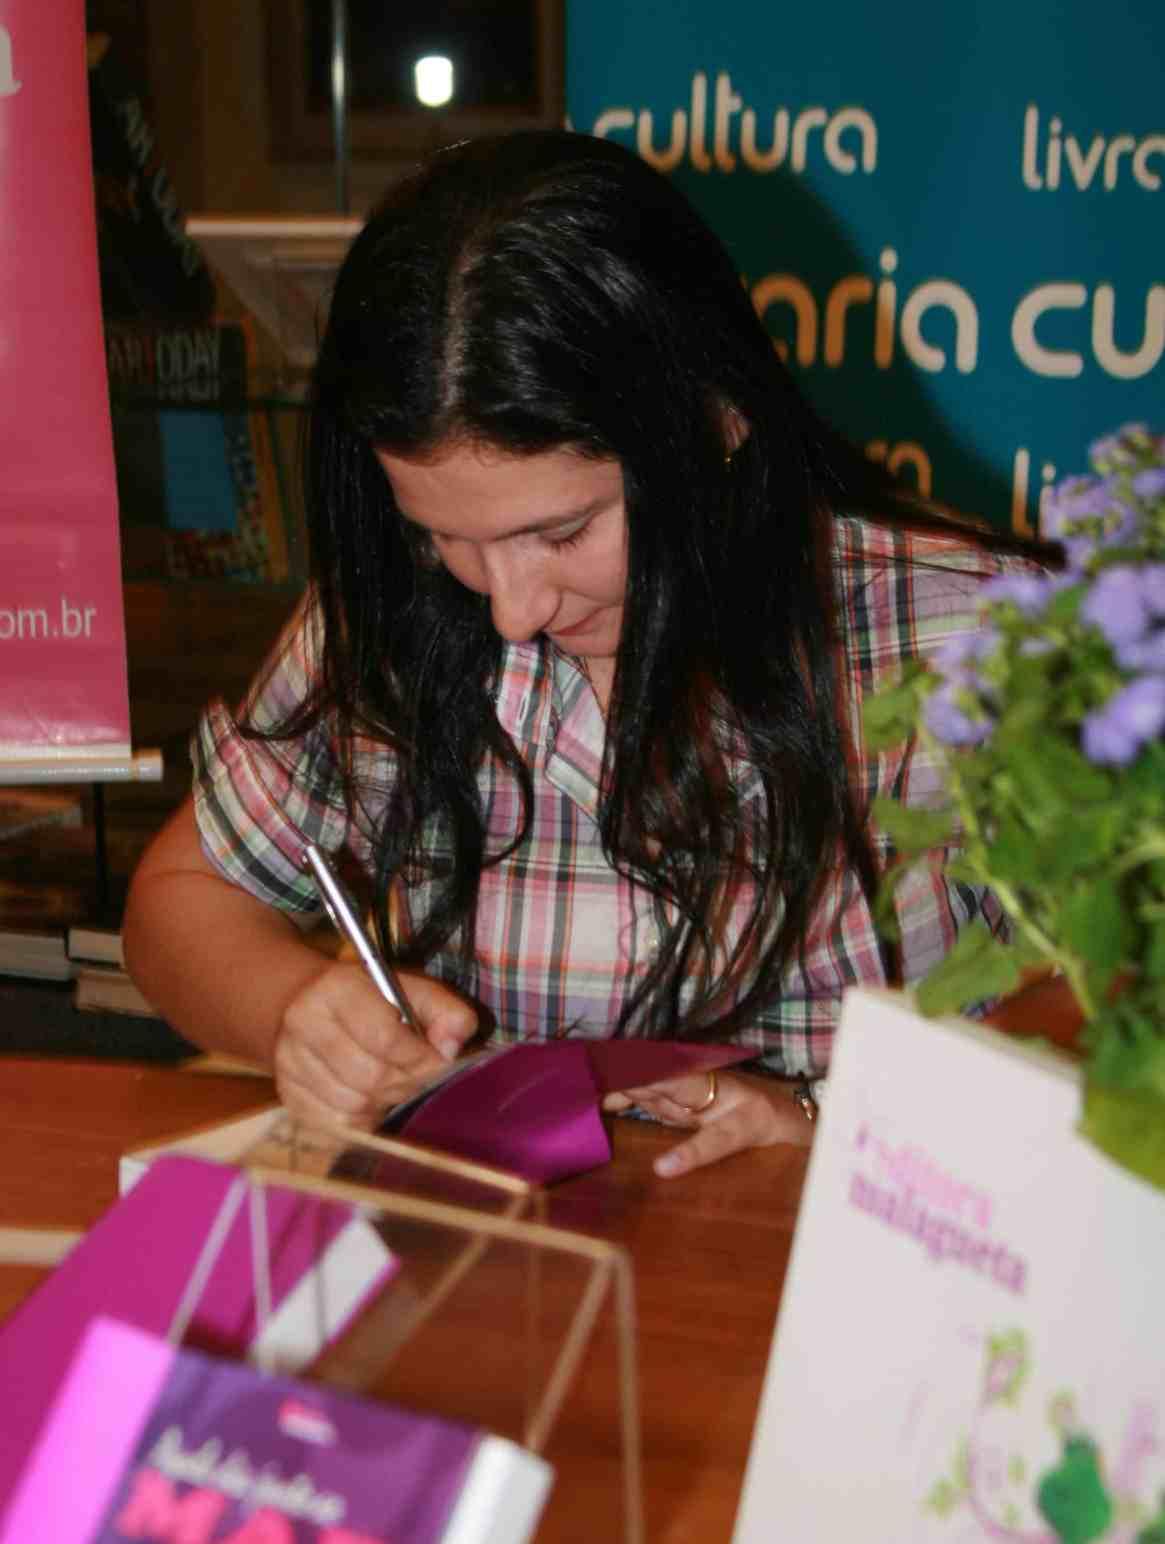 Karina Dias